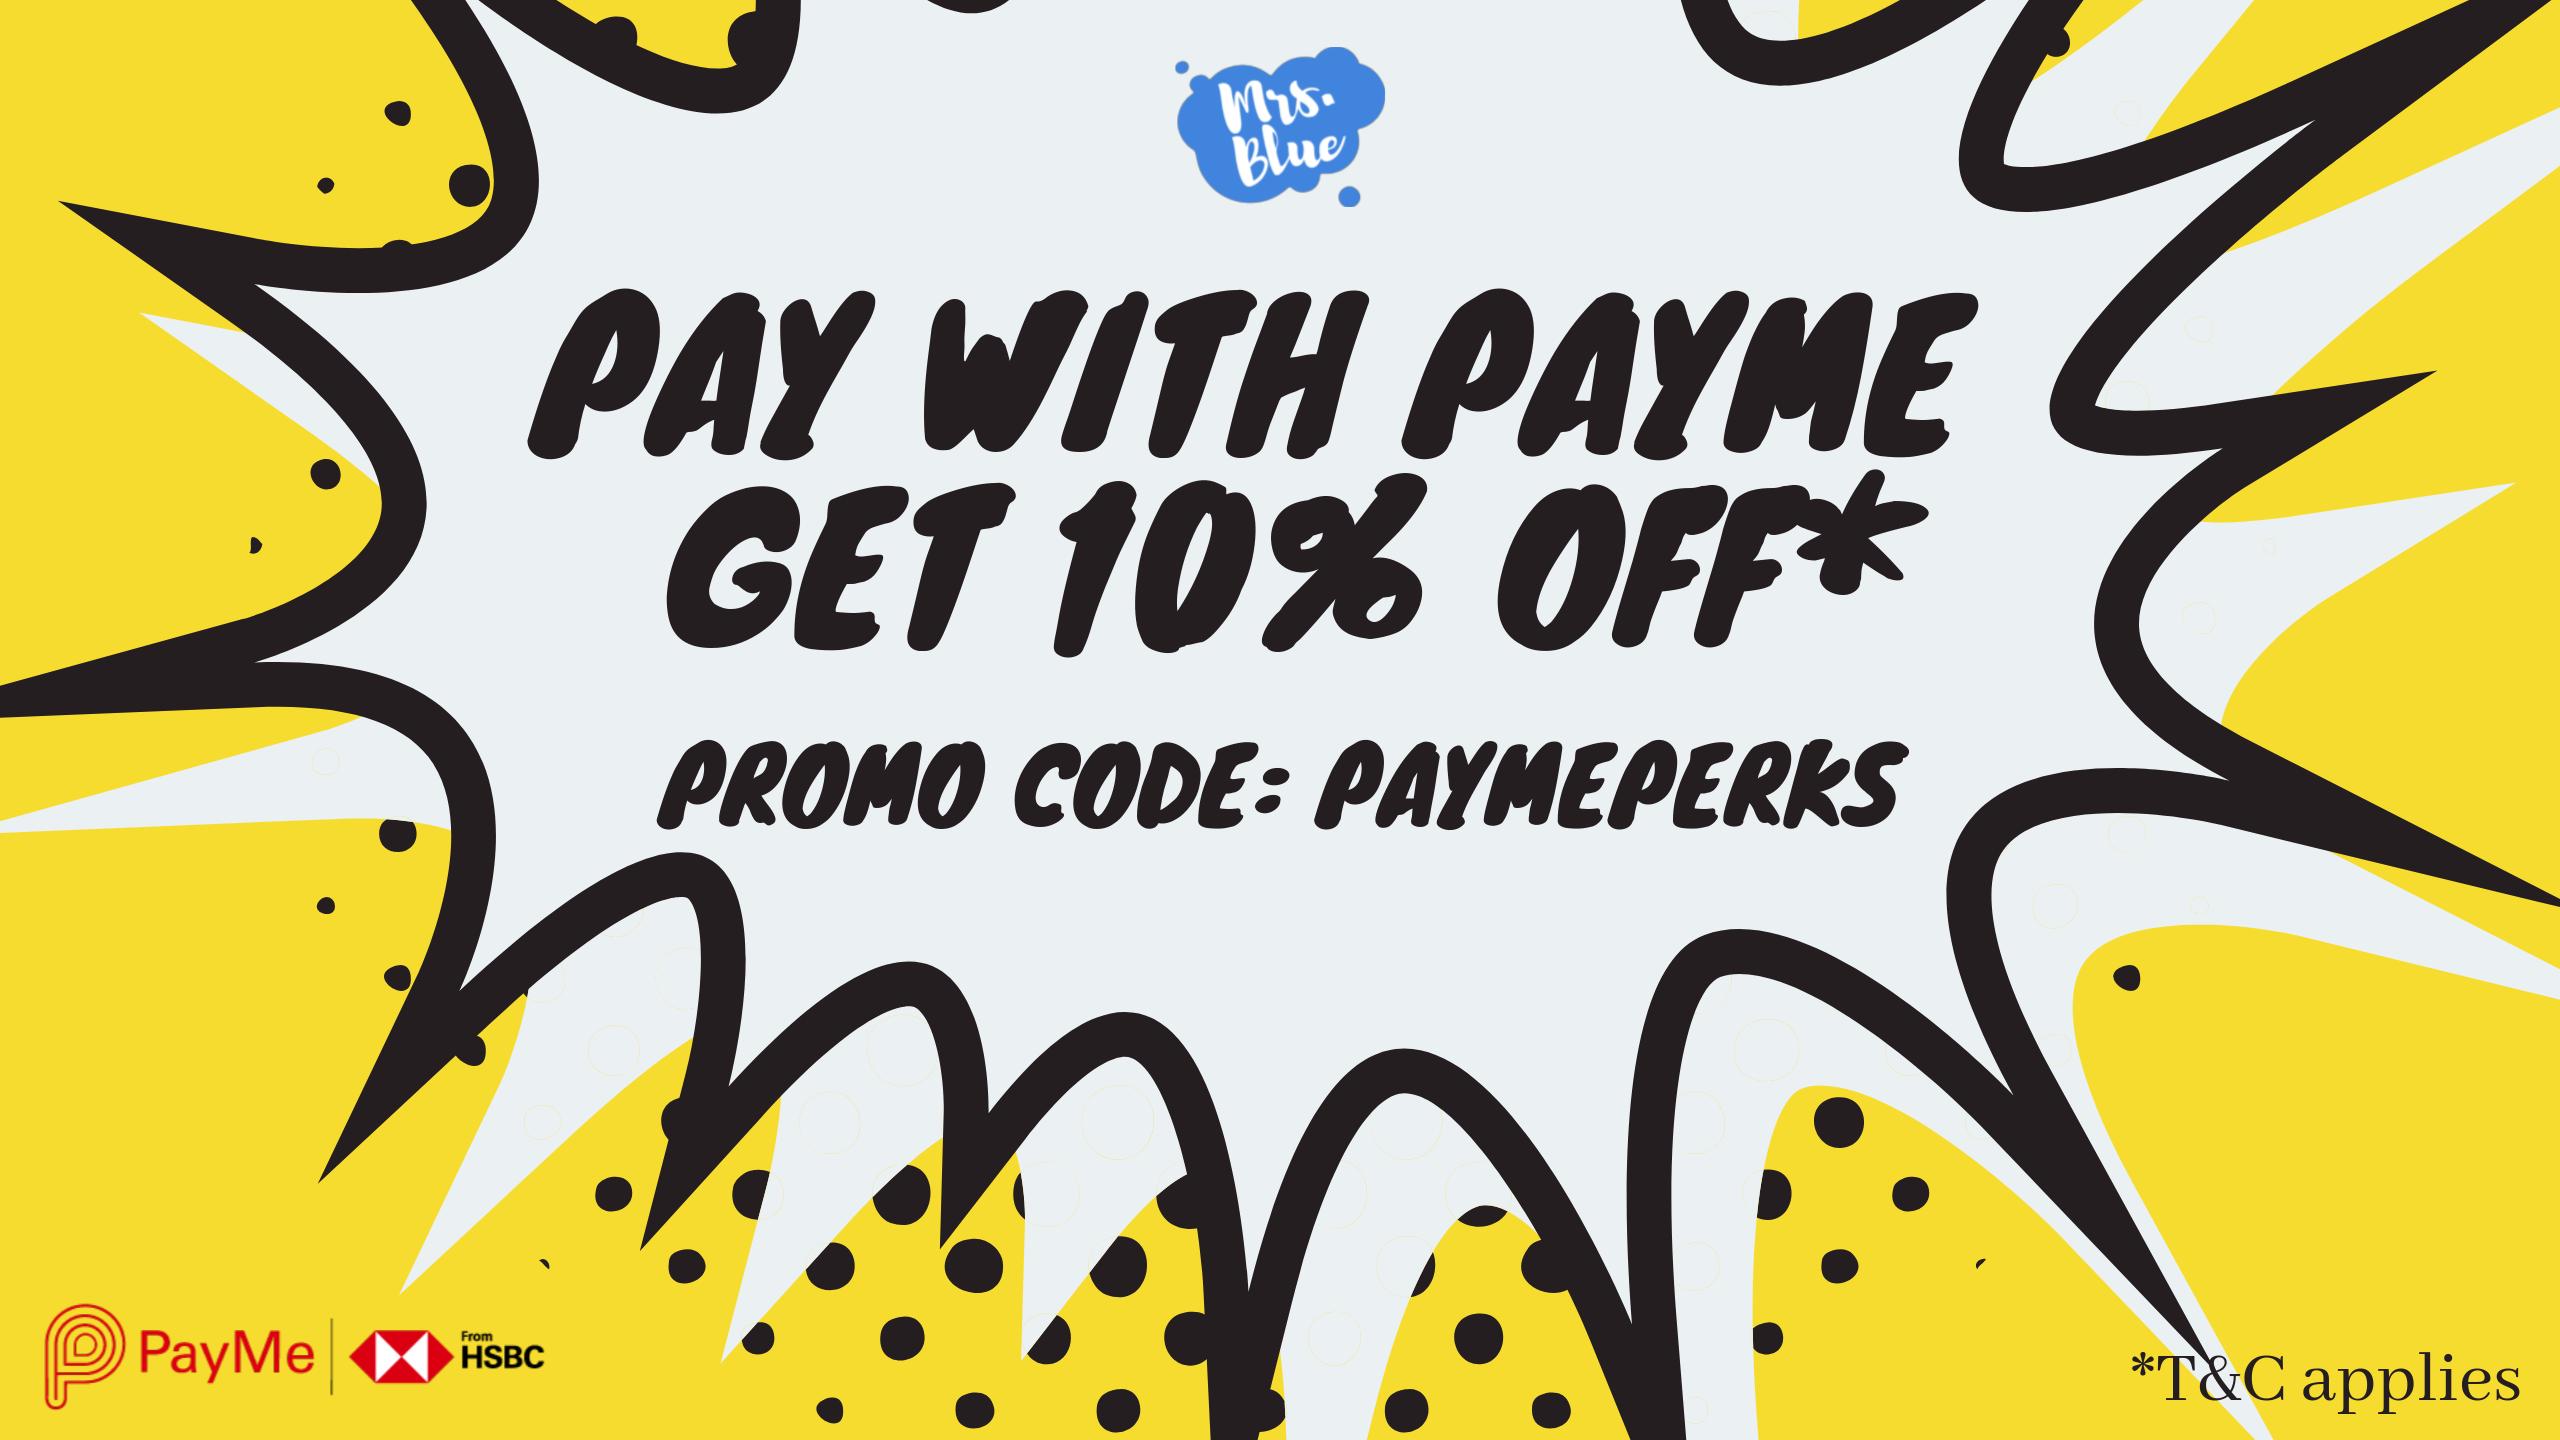 PayMe Perks